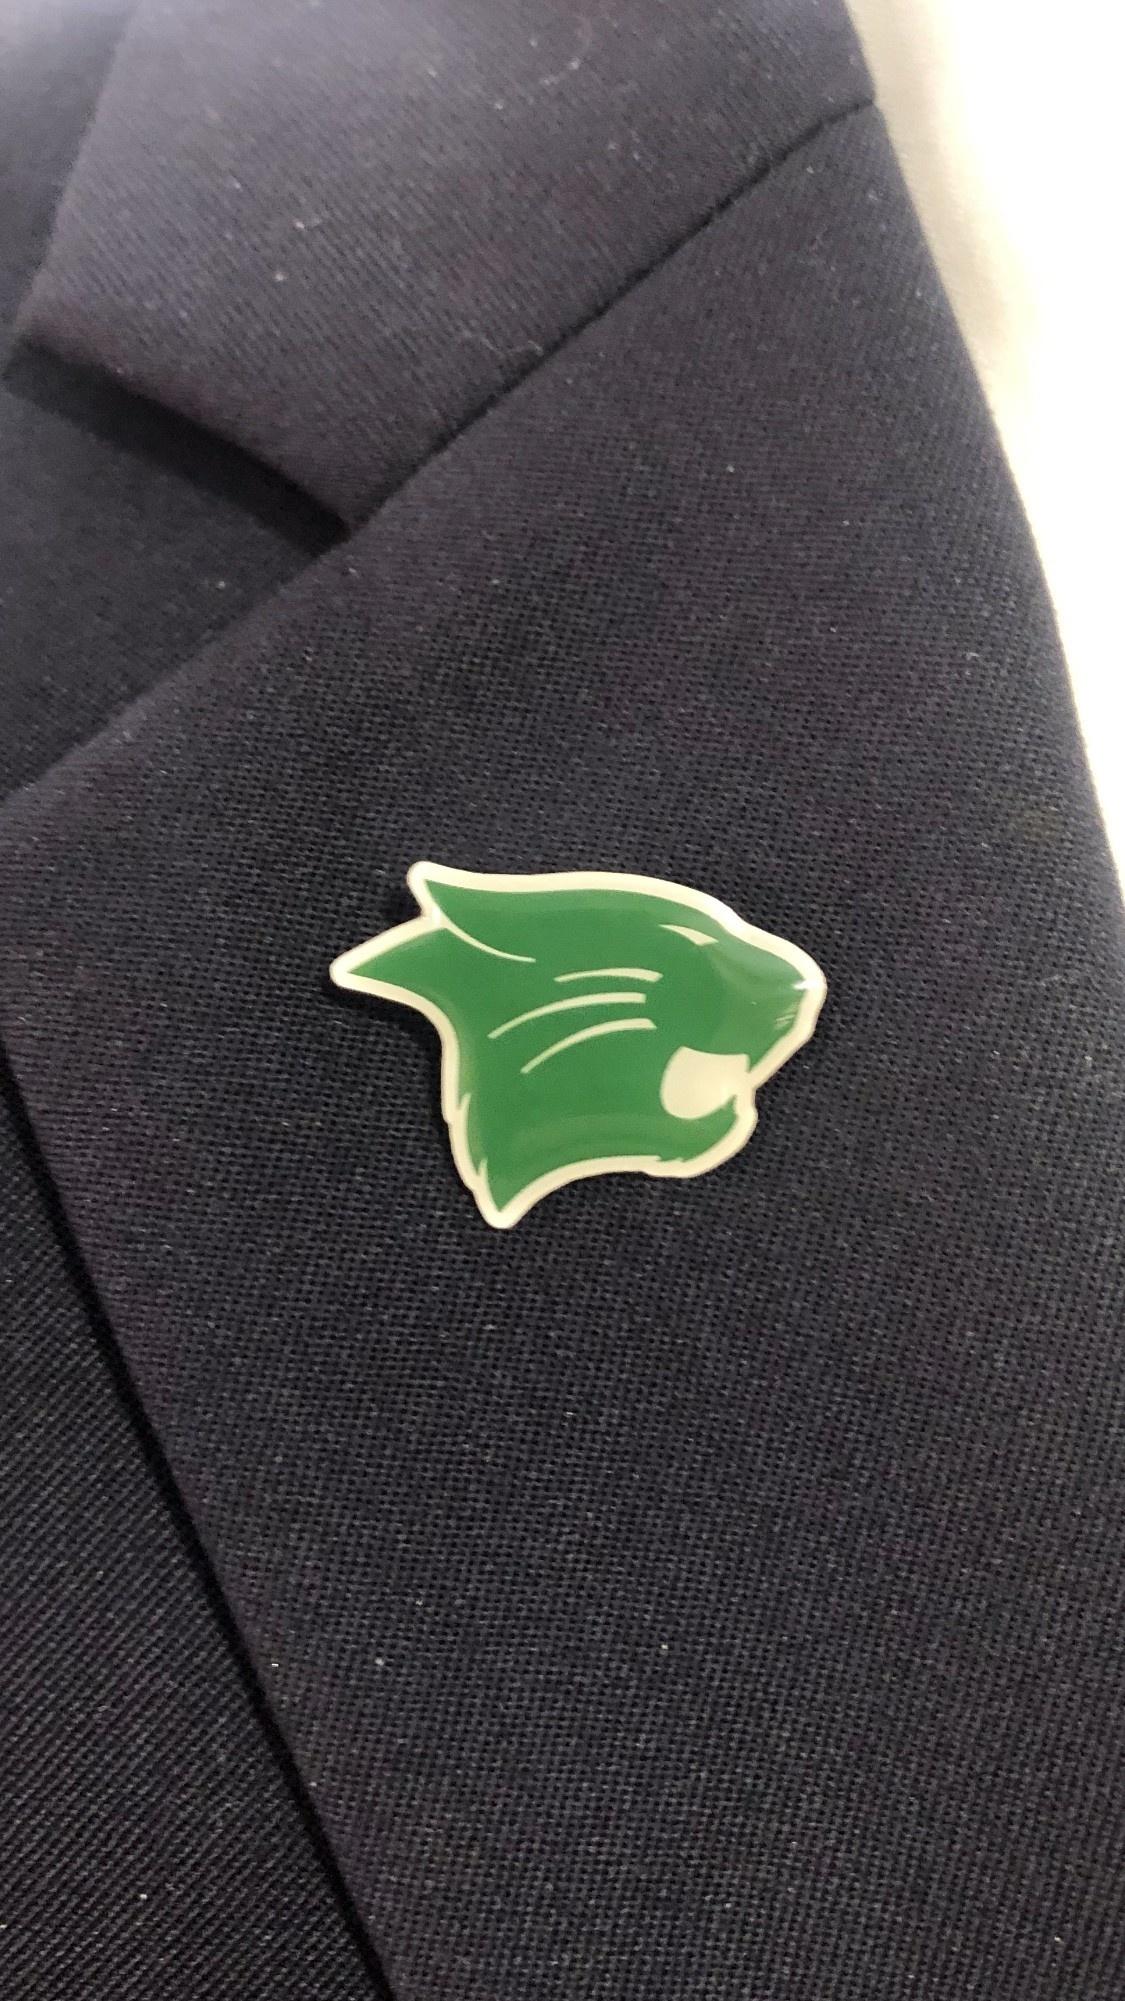 Lapel Pin: Westminster Wildcat Head